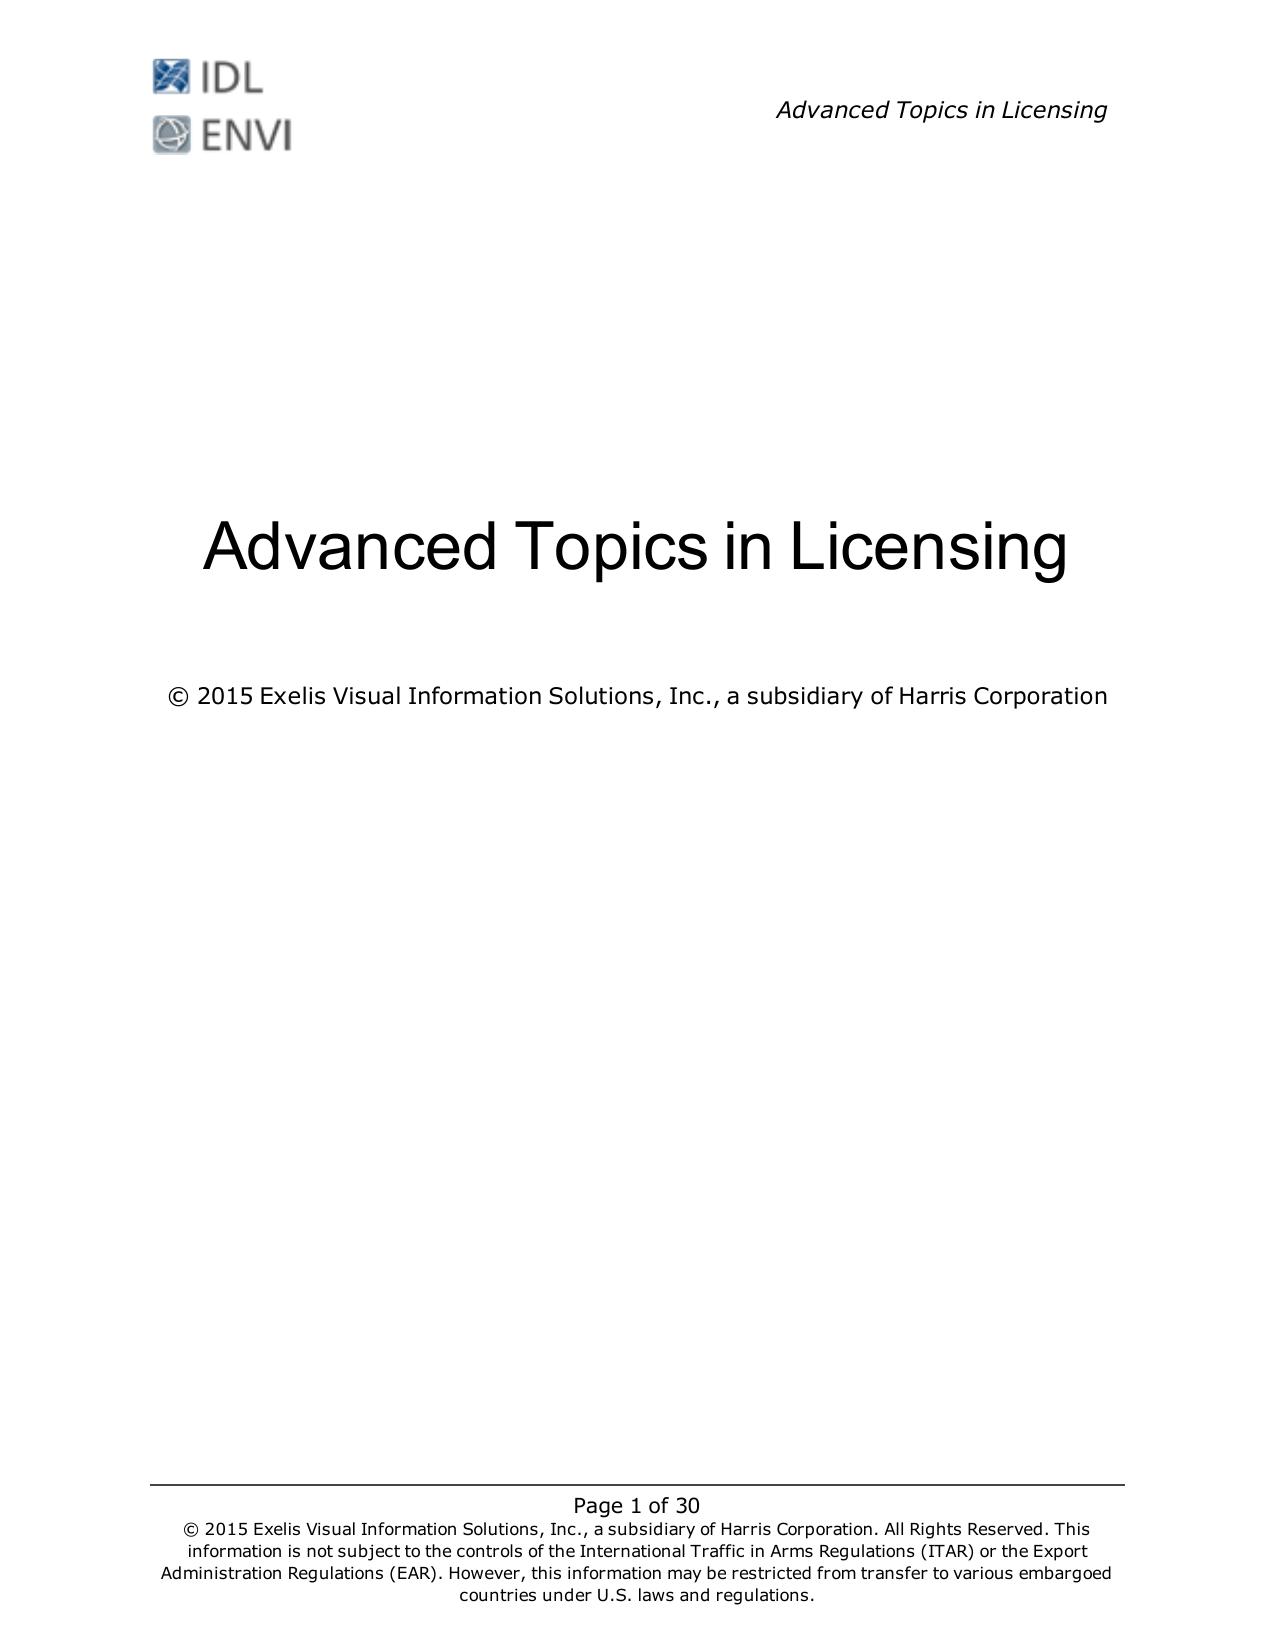 Advanced Topics in Licensing - Harris Geospatial Solutions